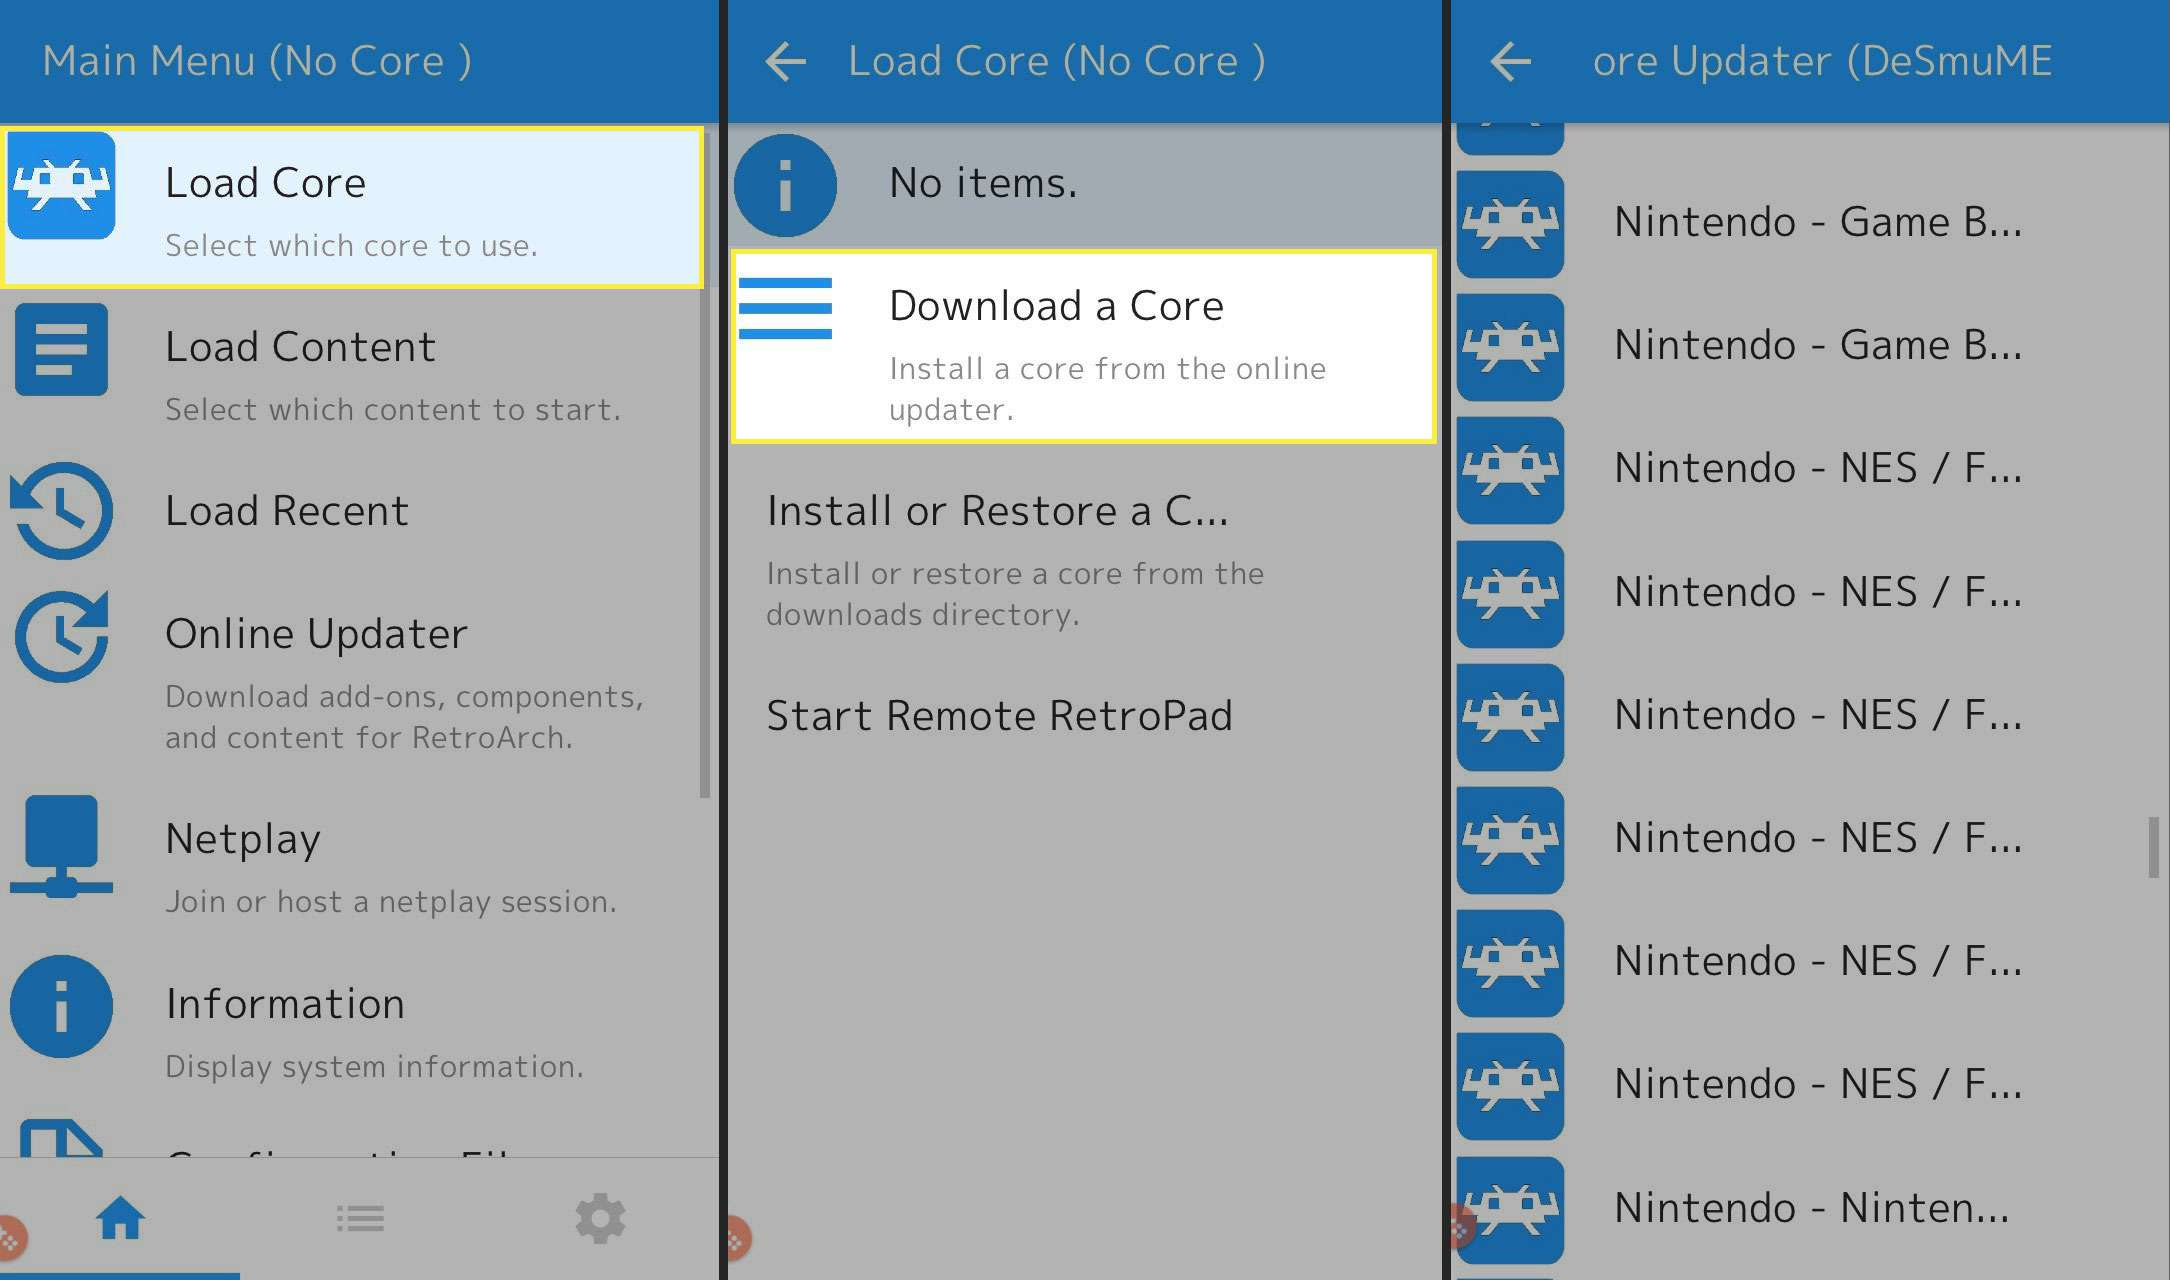 Downloading a core in the RetroArch app